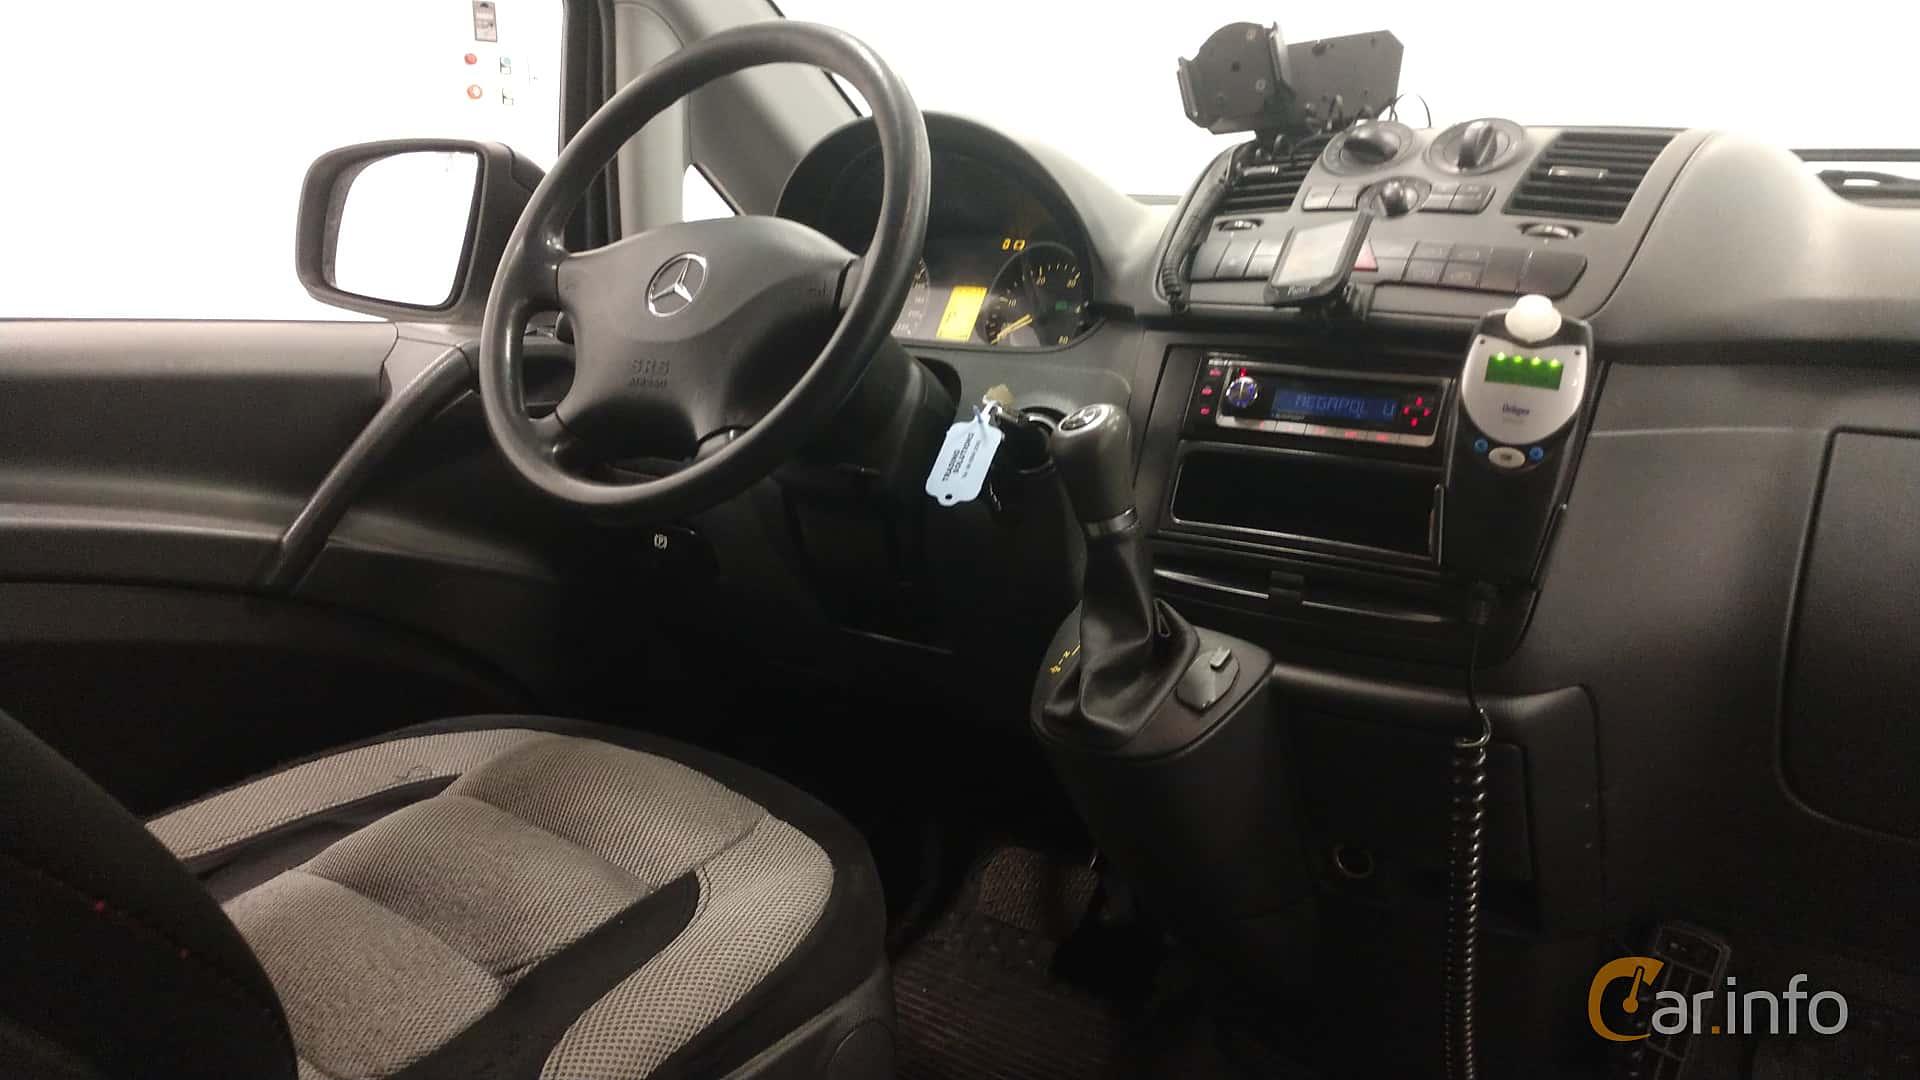 Mercedes-Benz Vito 116 CDI  TouchShift, 163hp, 2012